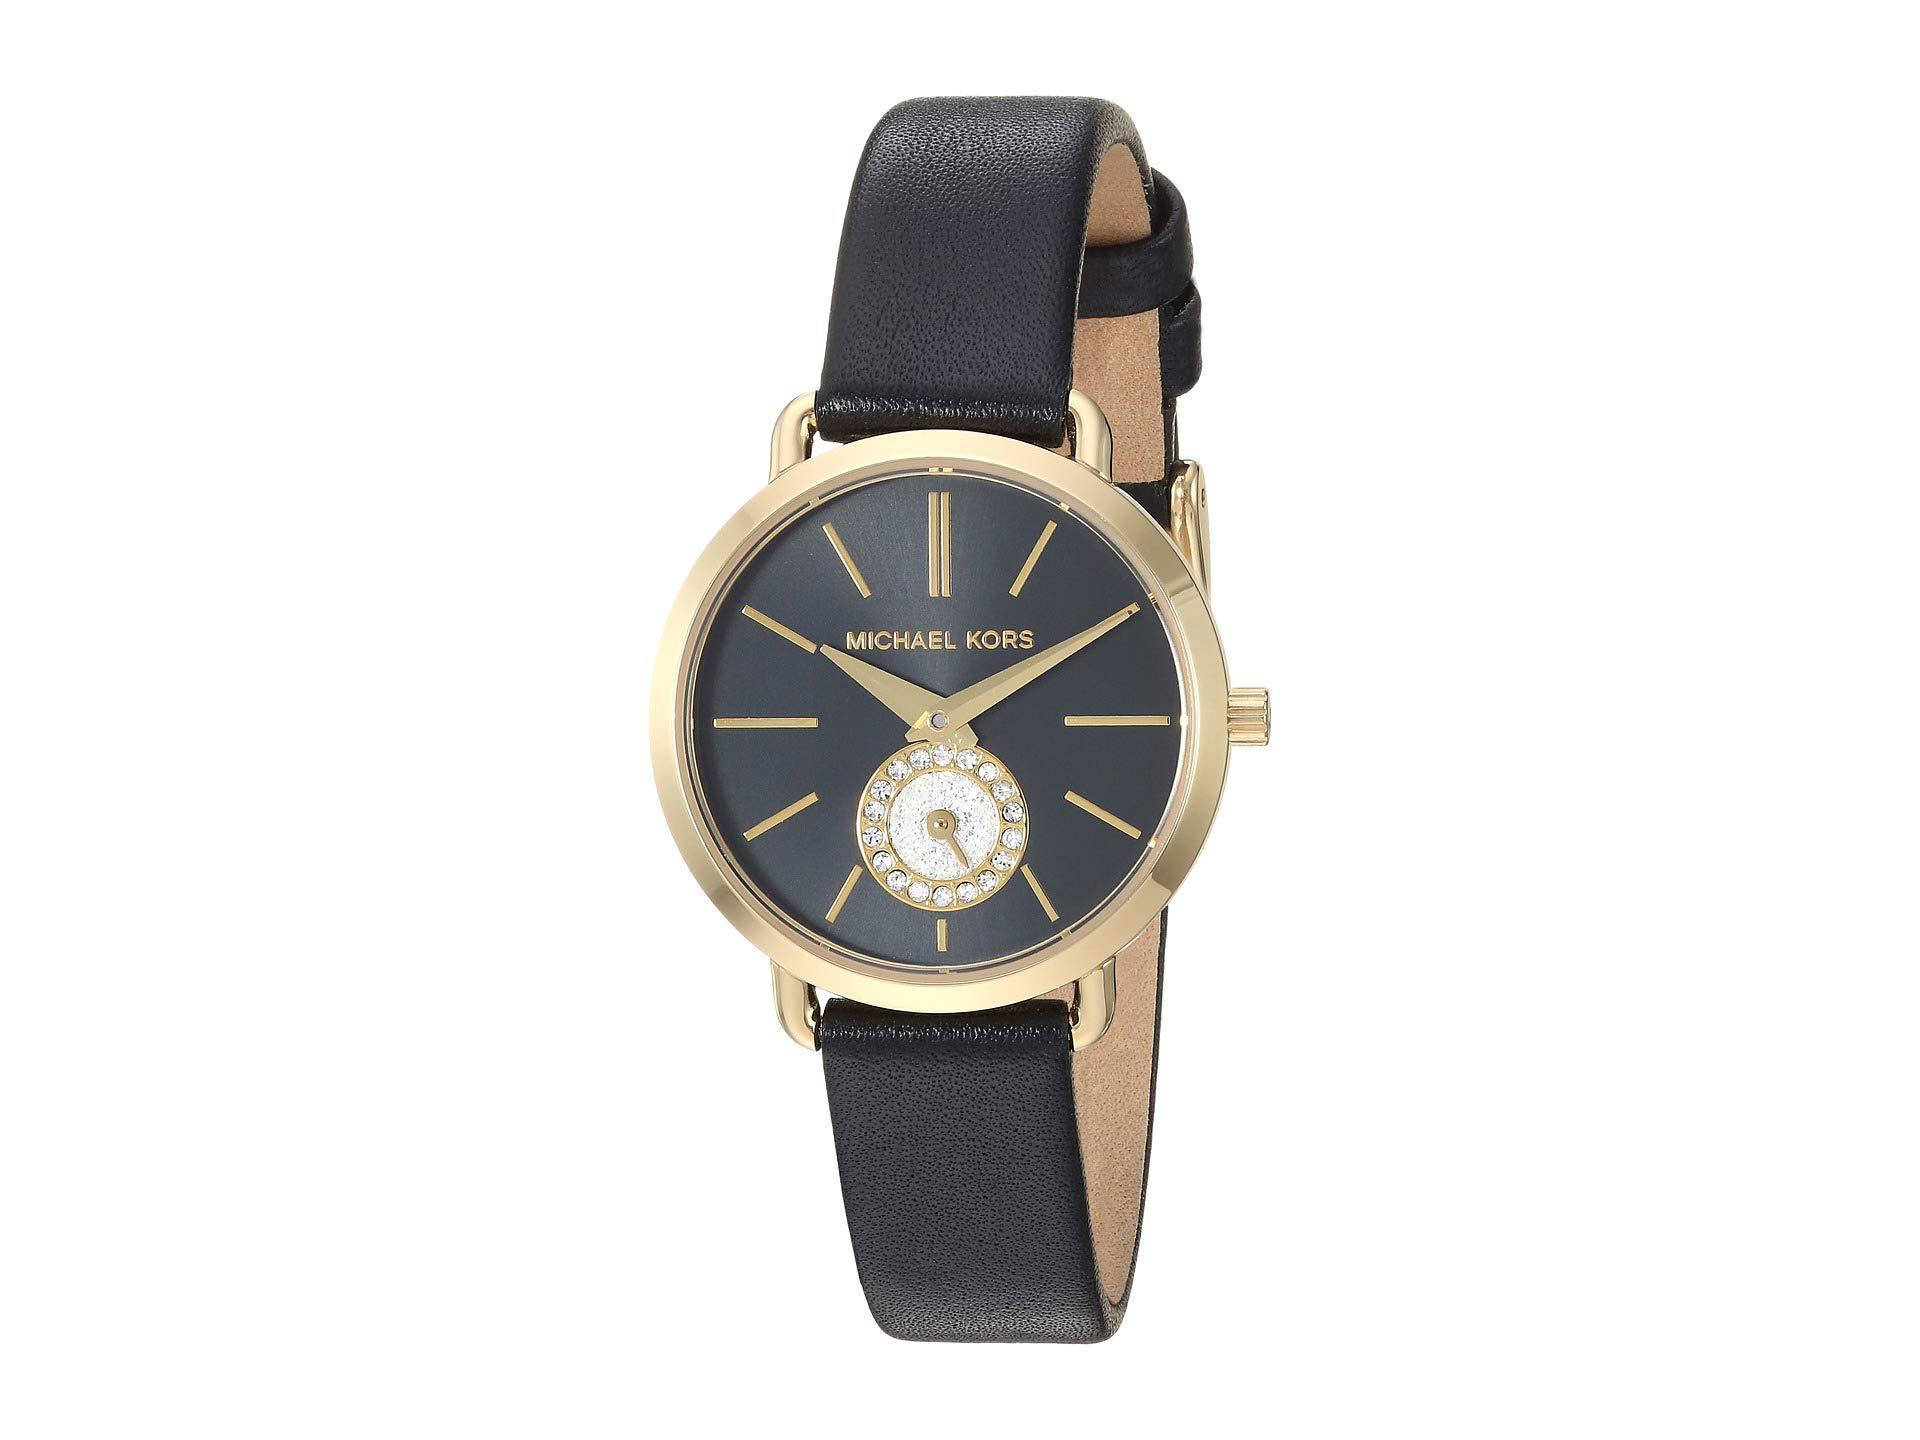 eaa8c2c0108f Lyst - Michael Kors Portia - Mk2750 (black) Watches in Black